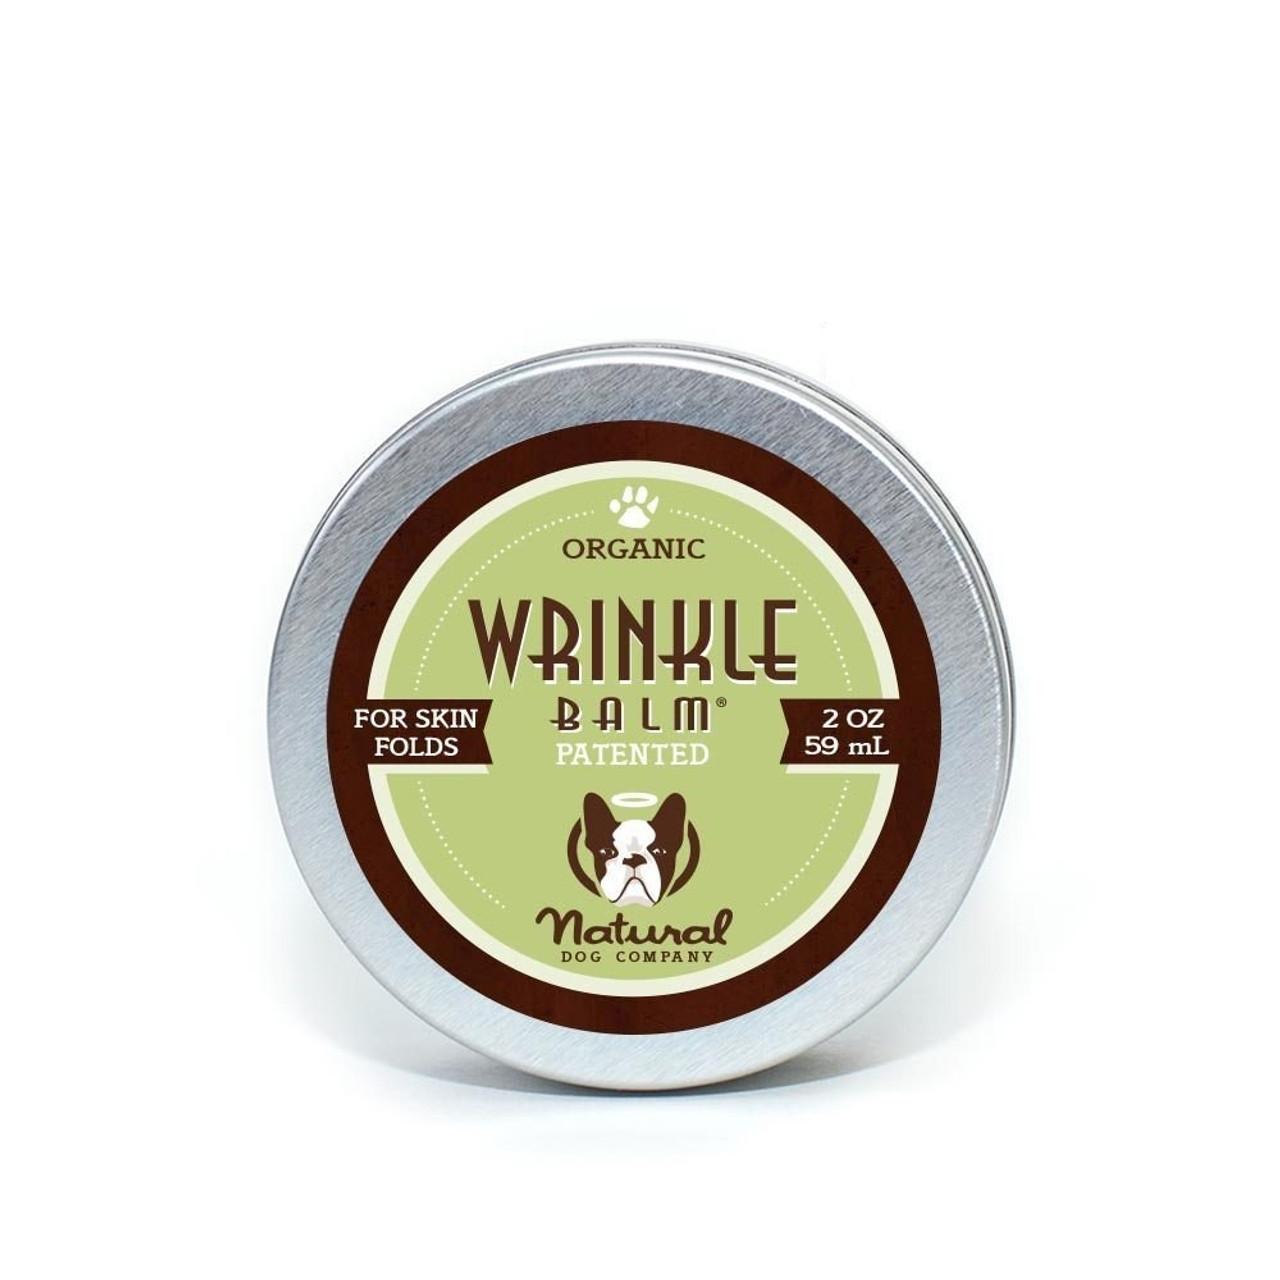 Natural Dog Company Wrinkle Balm Stick 100% Natural Organic Wrinkle Balm For Dry Crusty Dog Wrinkles